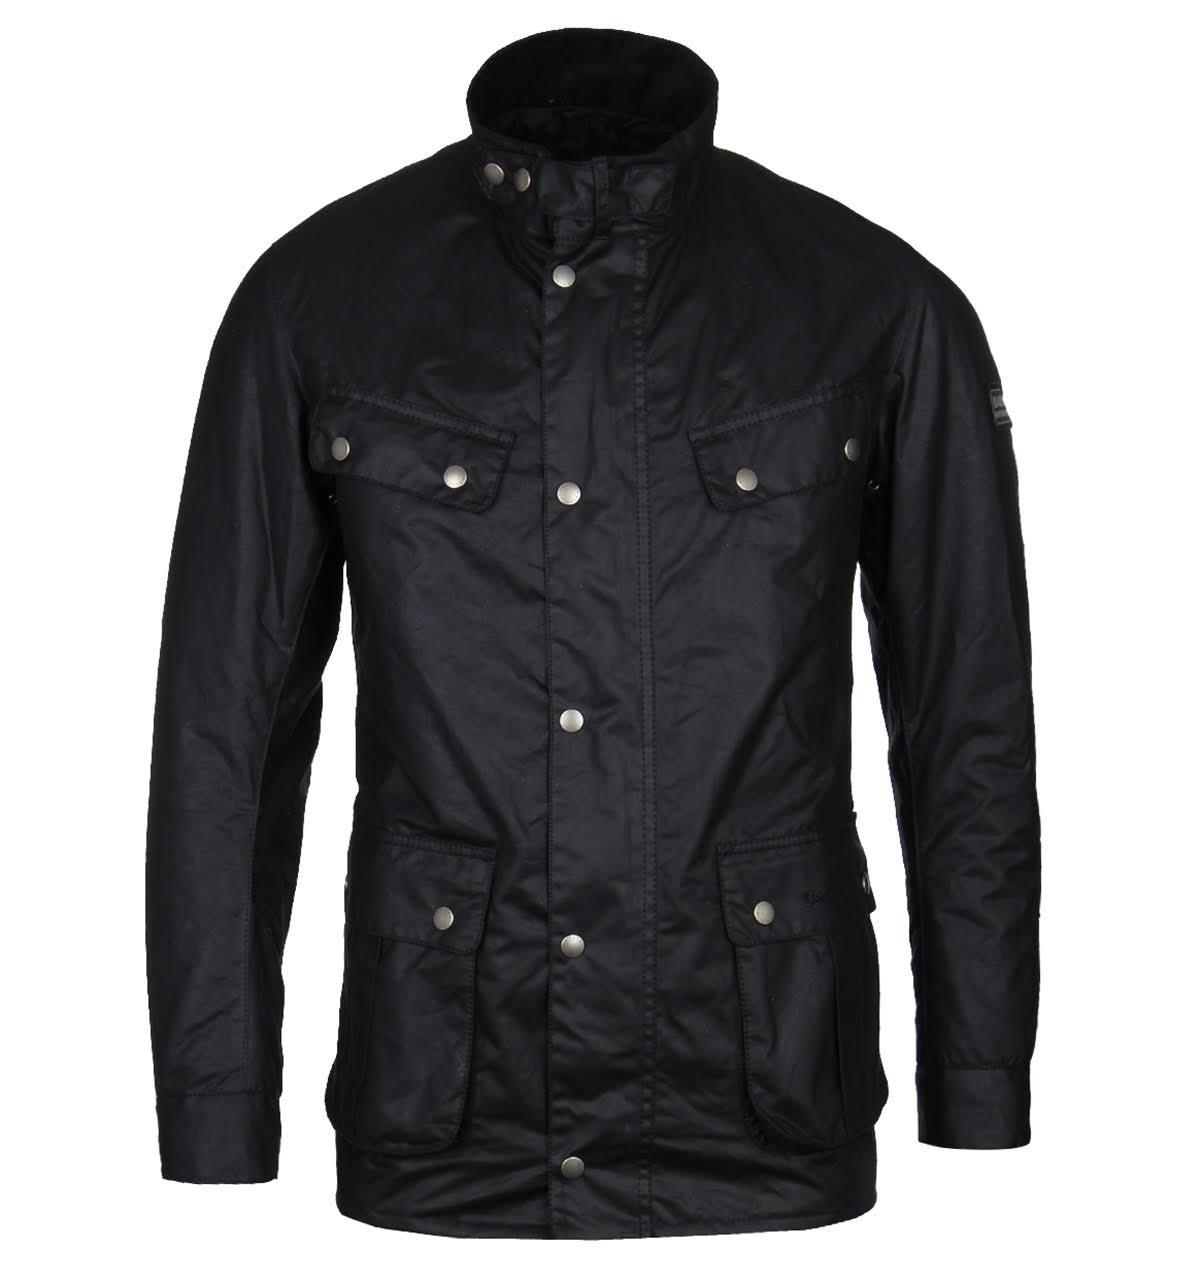 Barbour Mwx0337bk91 Waxed Jacket Duke Mens International Schwarz 6gwqP6